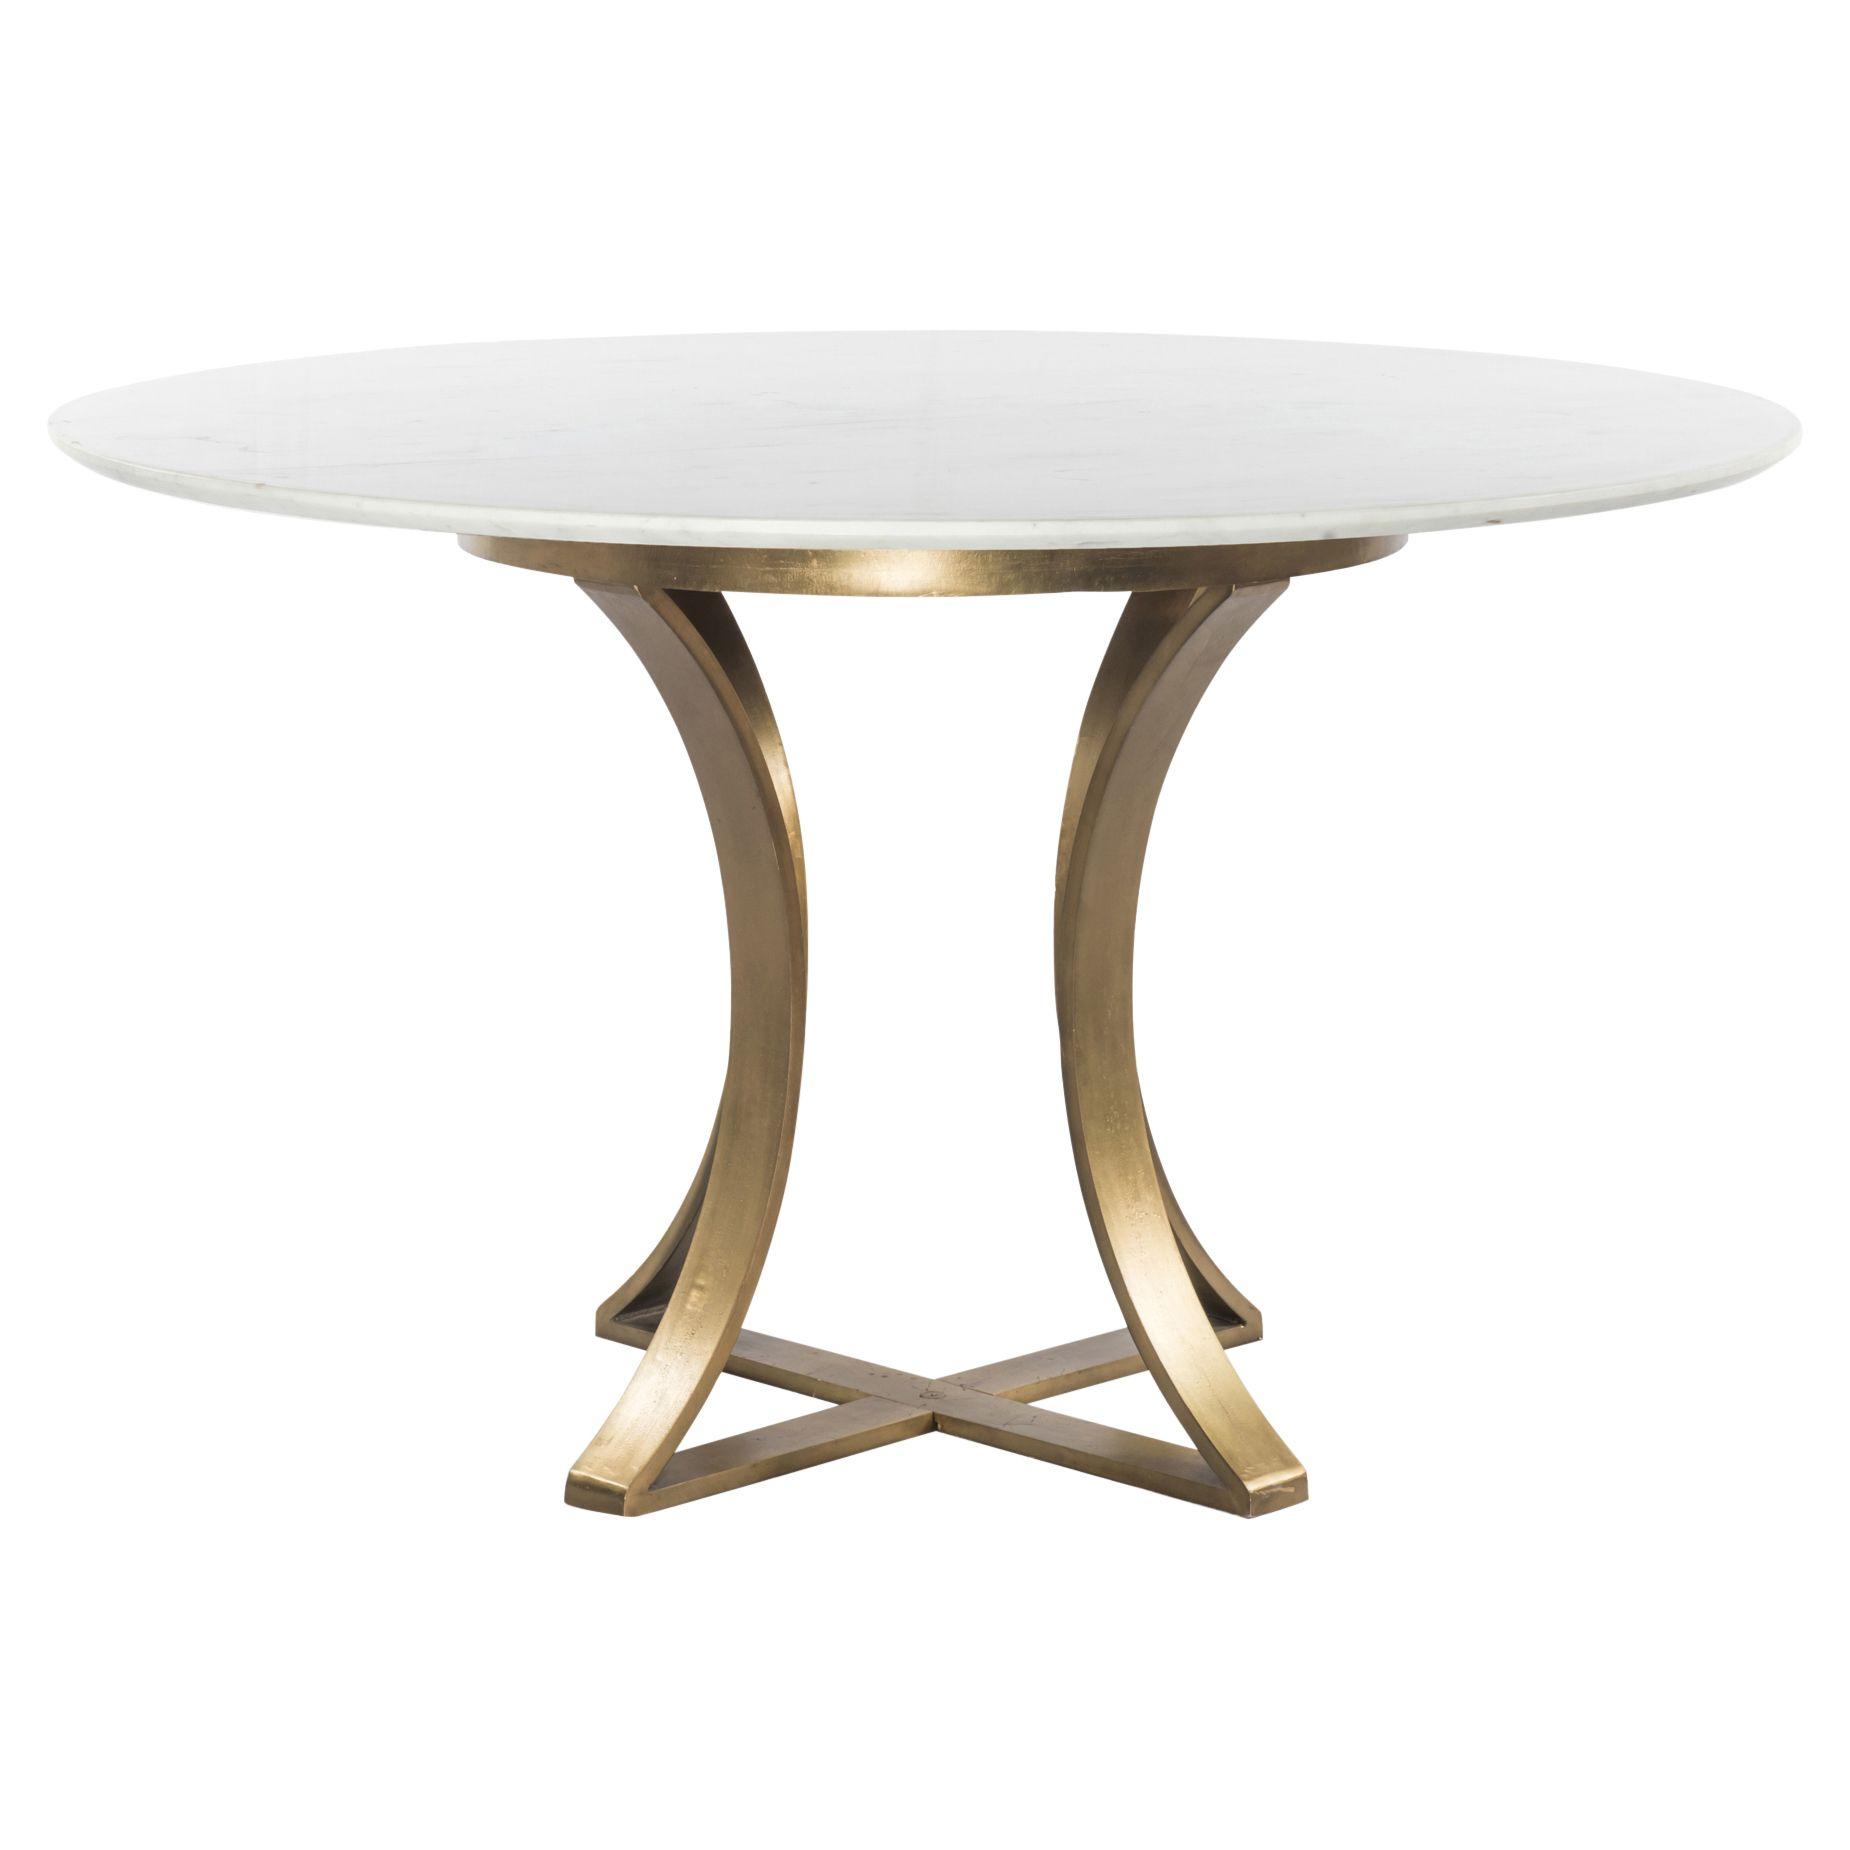 Grace Modern Classic Cast Brass Round White Marble Dining Table 48d In 2021 Dining Table Marble Modern Round Kitchen Table Round Dining Table Sets